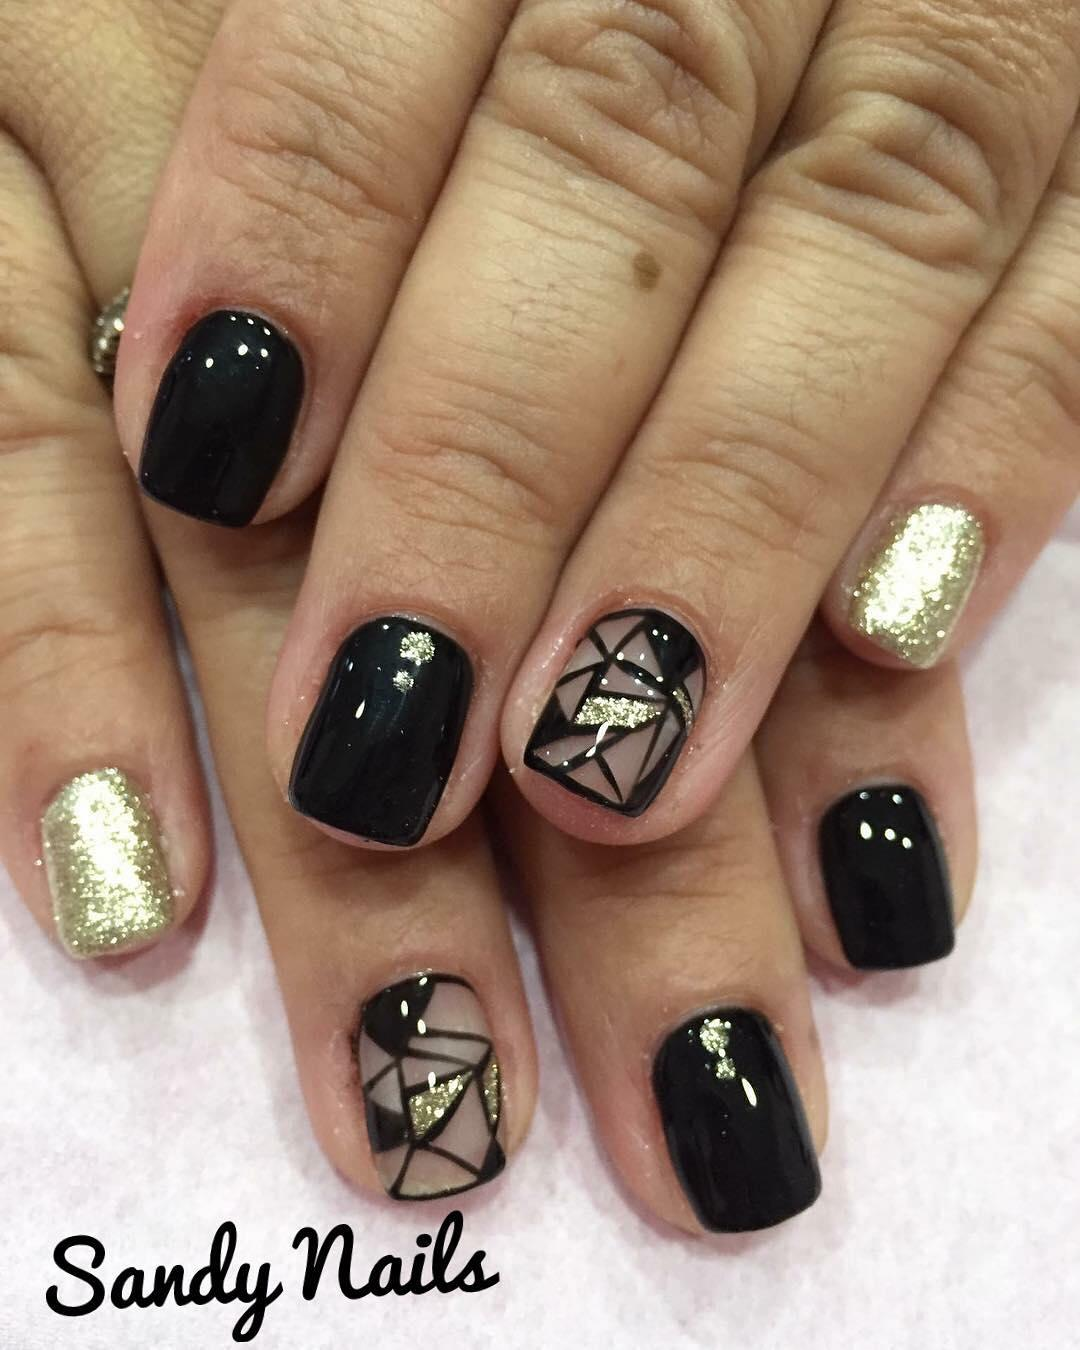 trendy black nail art designs and ideas 2019 5 - Trendy Black Nail Art Designs and Ideas 2019